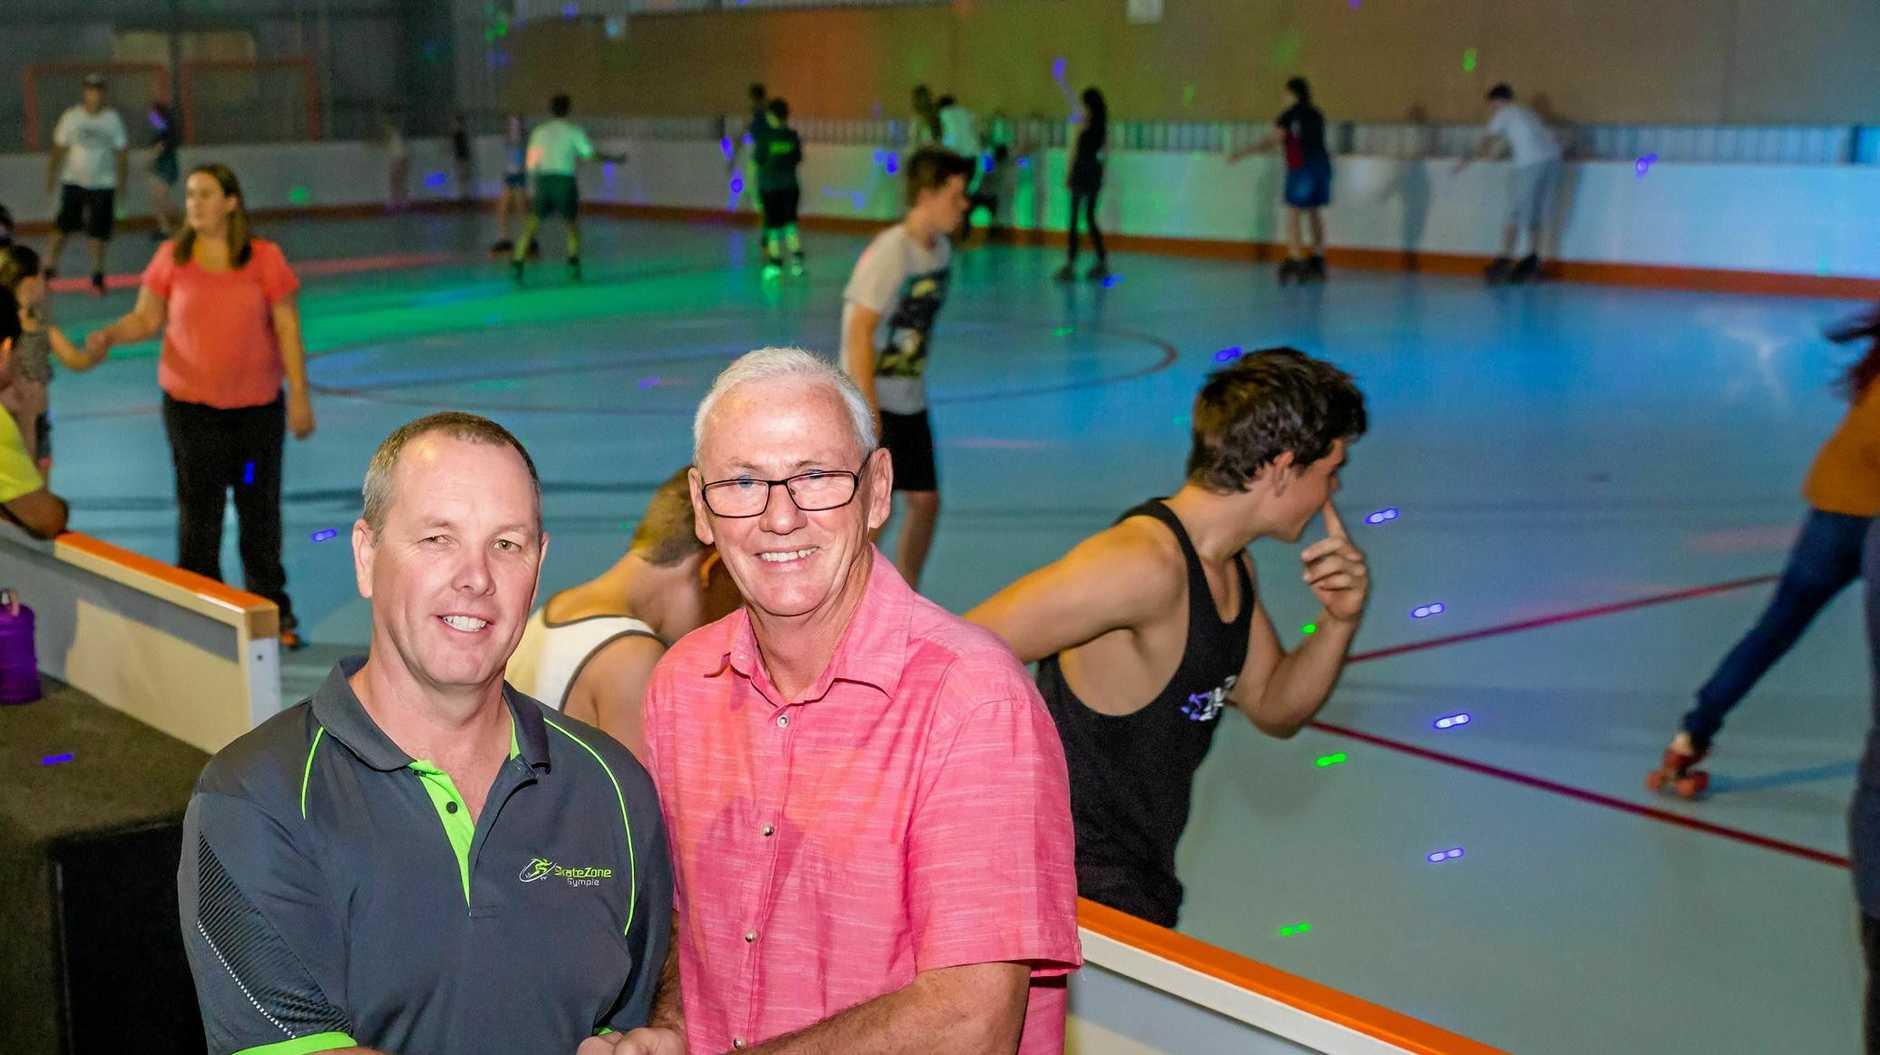 Skatezone, Darren Nyberg (New Owner/Manager), Allan James (Previous Manager Skateland)